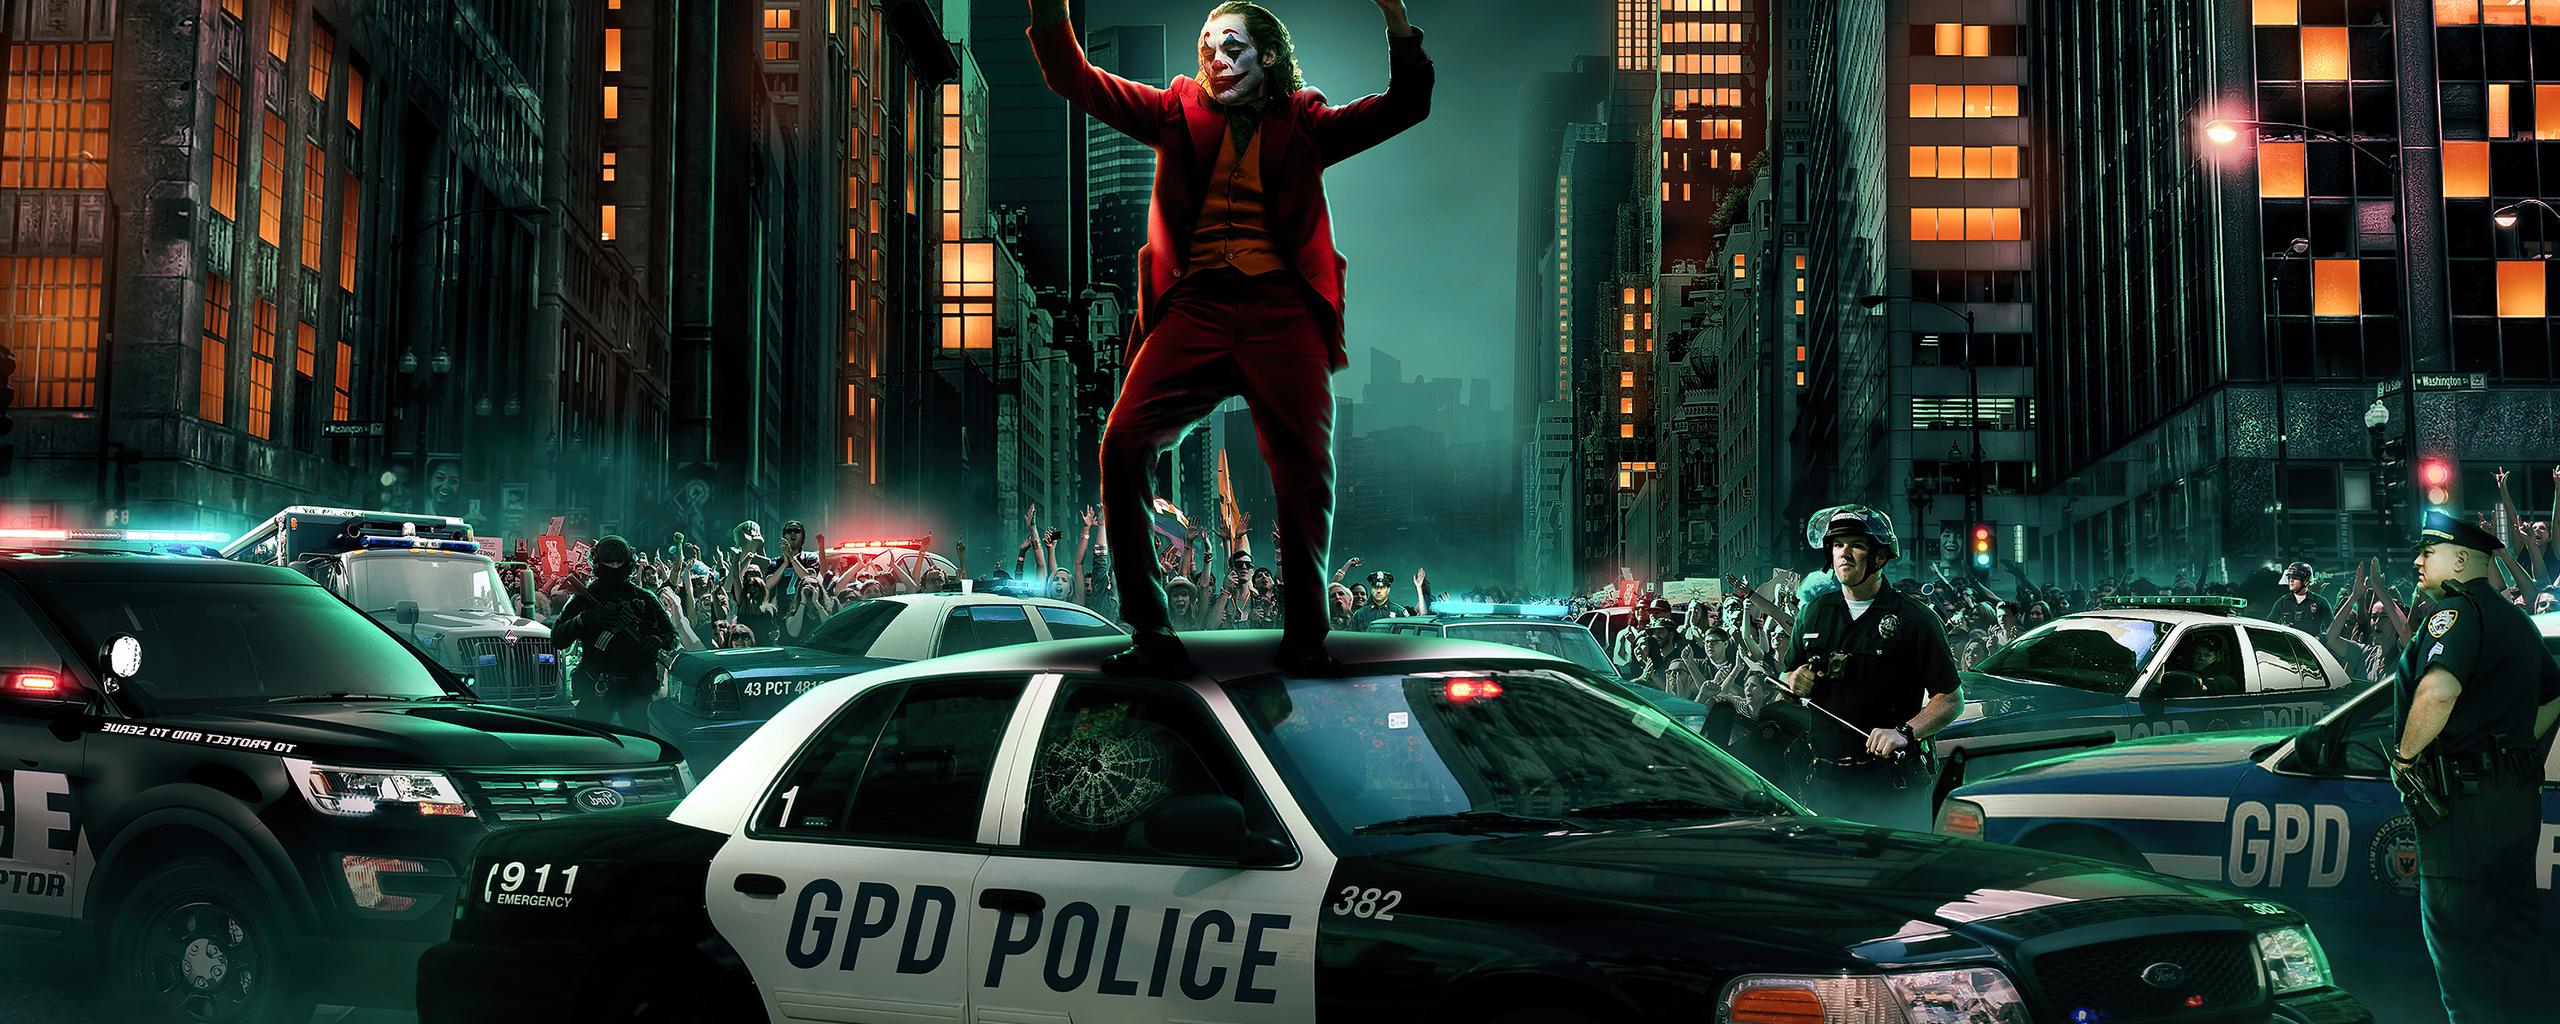 joker-dancing-on-cop-car-4k-pi.jpg